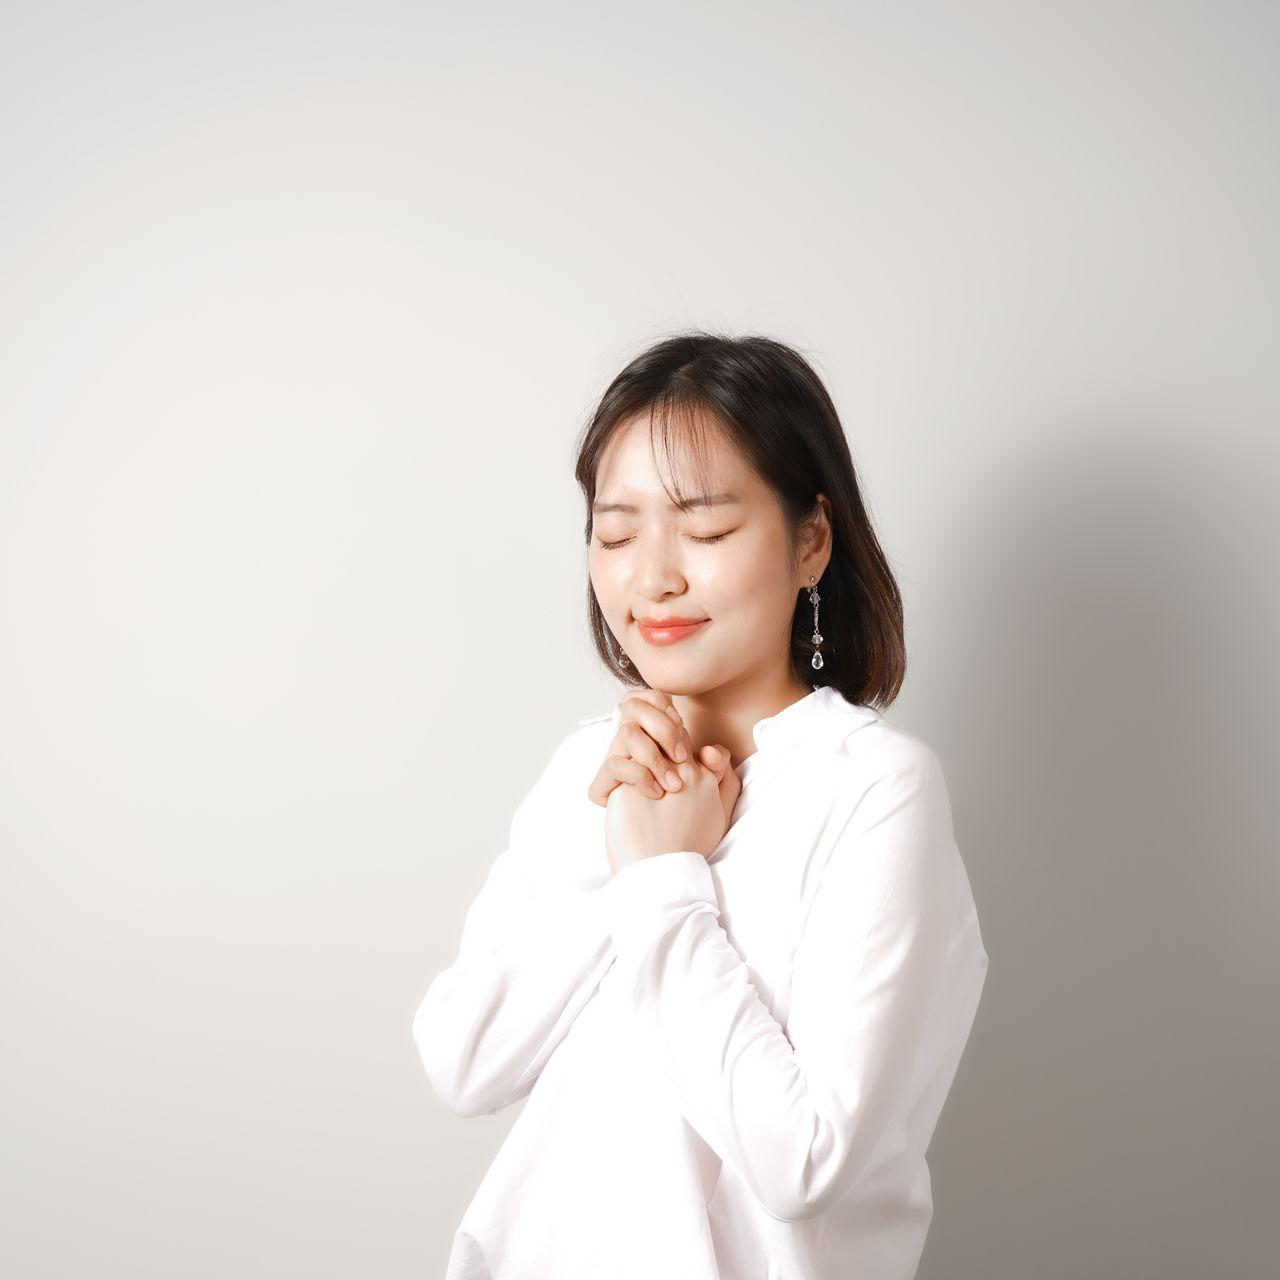 "<b>Kim Ha Eun</b><br><span style=""letter-spacing: -1px; font-size: 14px; color: rgb(113, 113, 113);"">Assistant<br>"